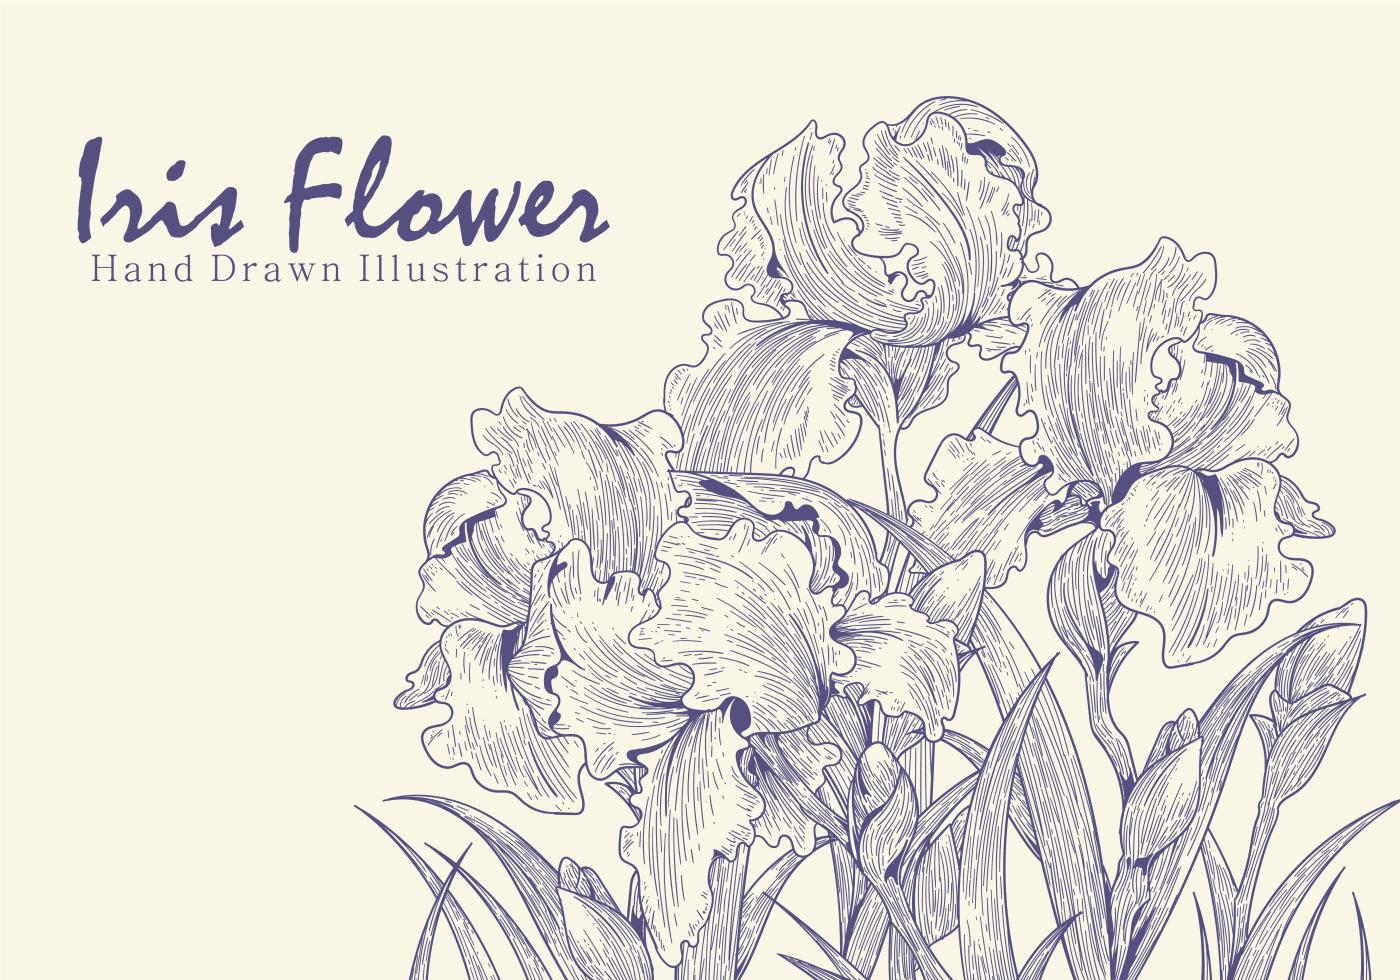 Free hand drawn iris flower vectors download free vector art free hand drawn iris flower vectors download free vector art stock graphics images izmirmasajfo